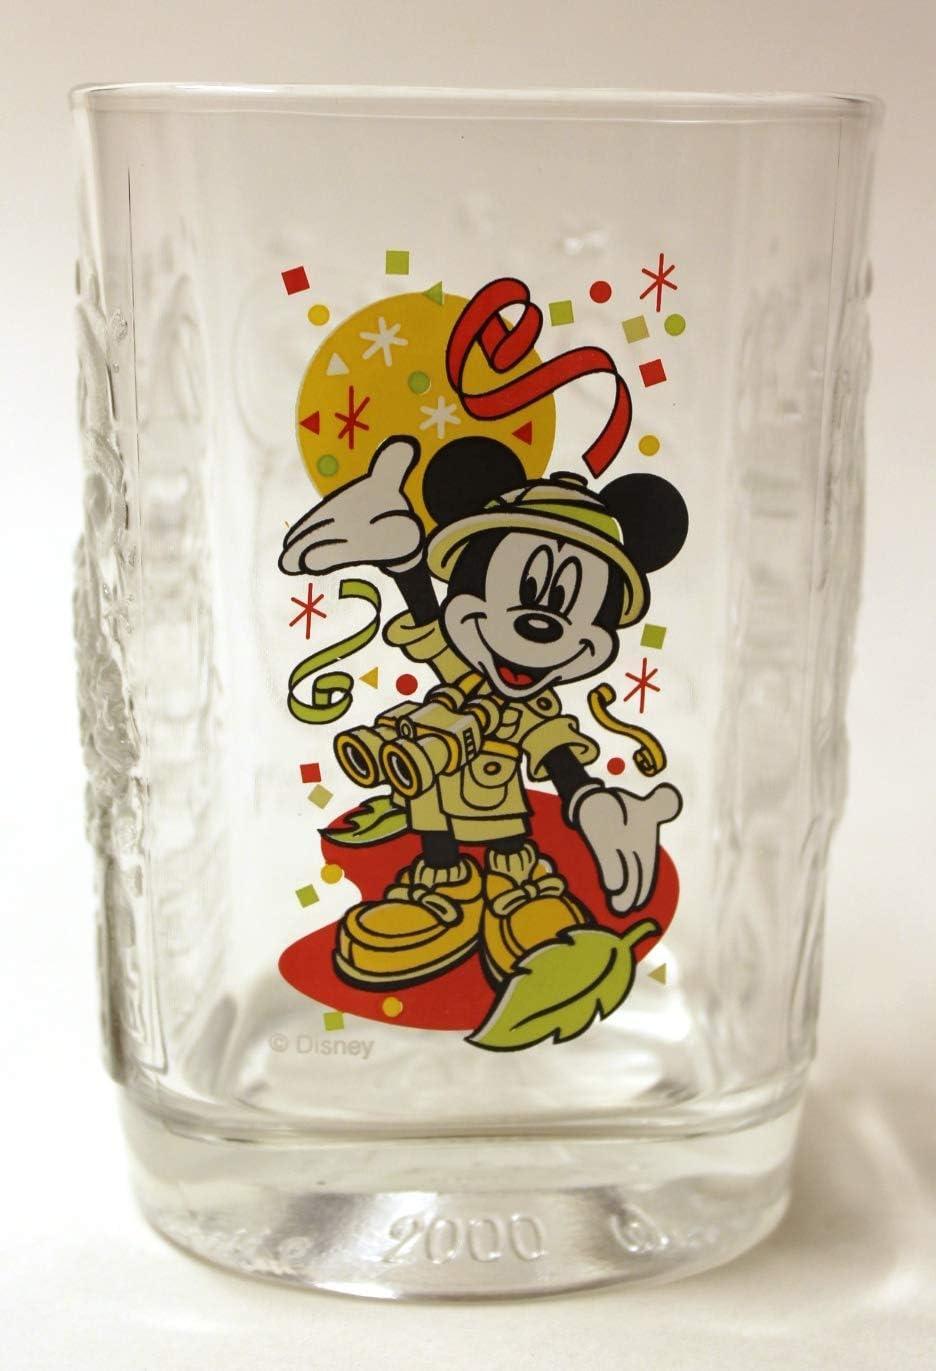 Disney's Animal Kingdom, 2000 McDonald's Commerative Glass